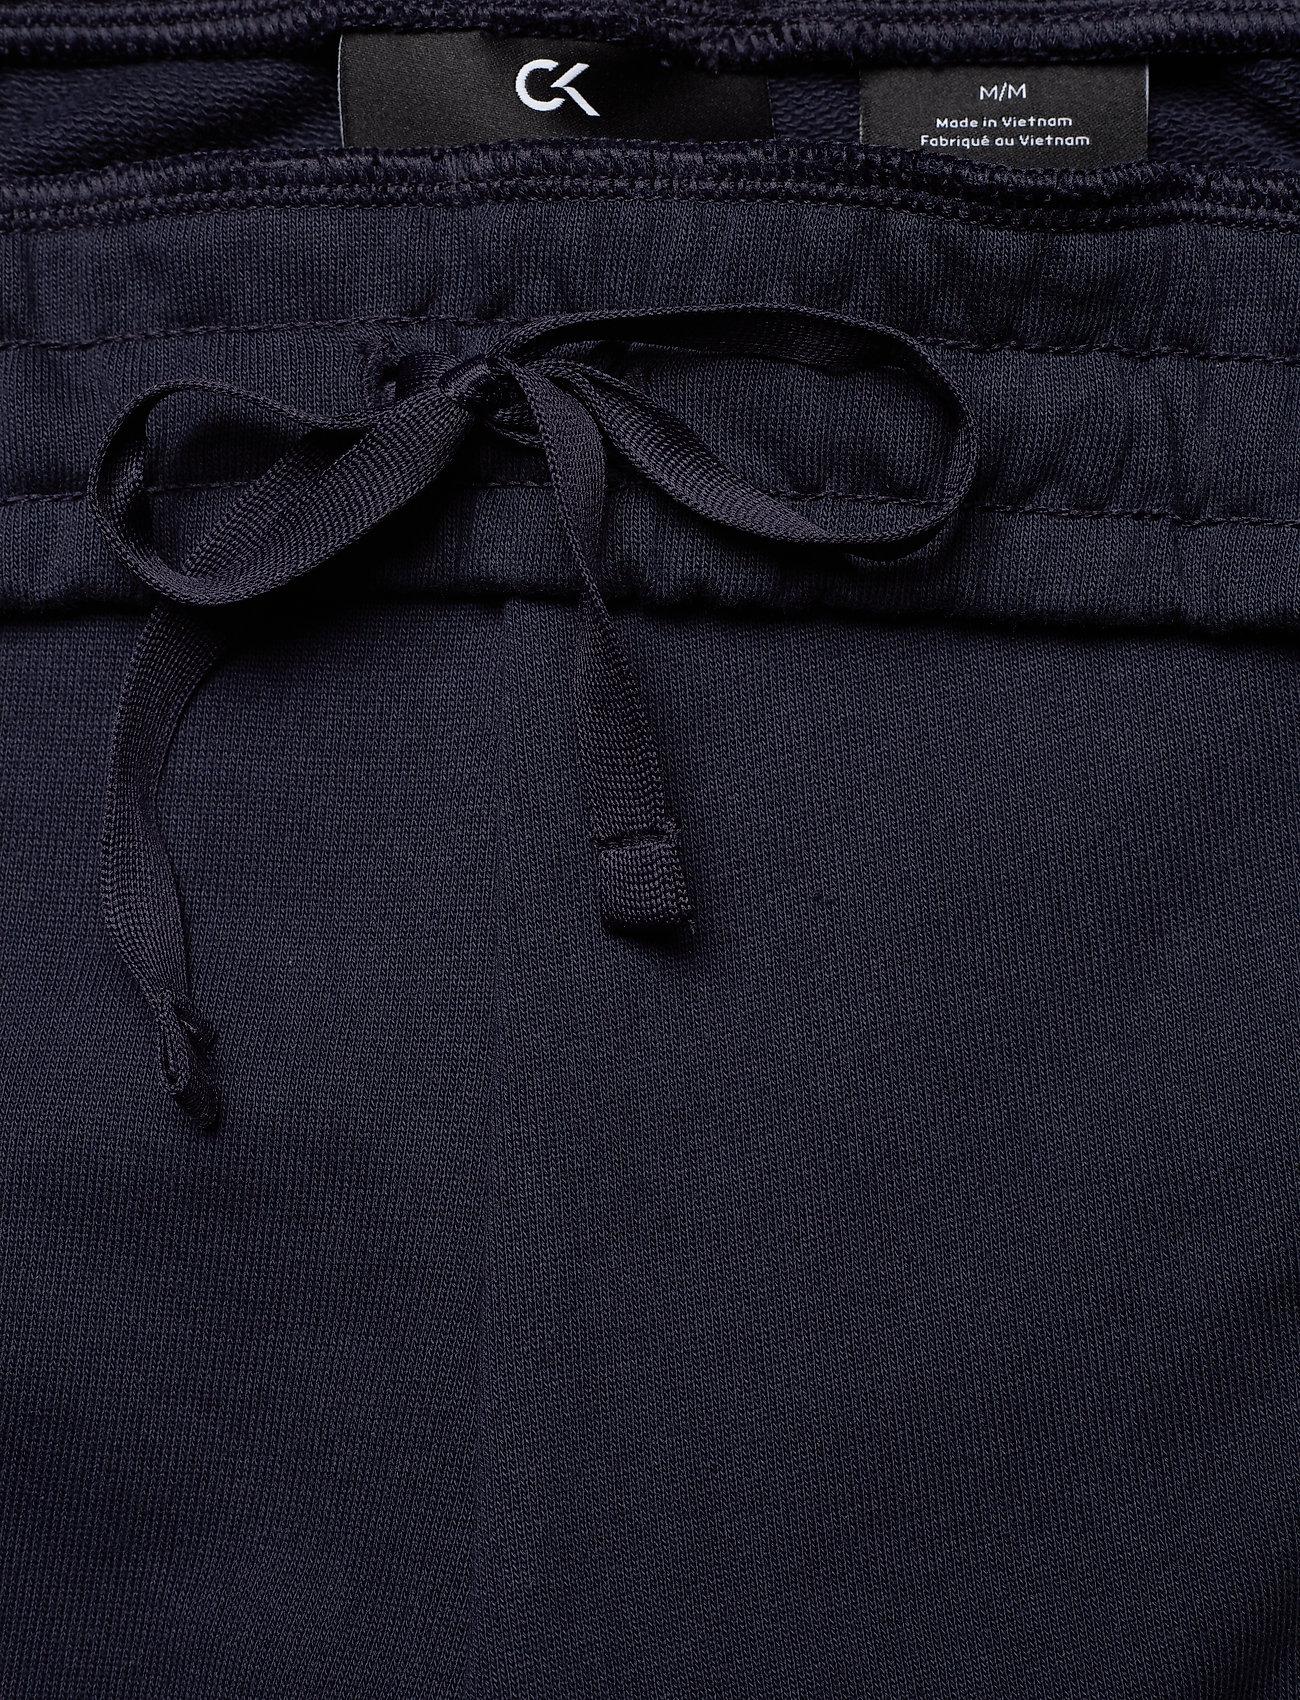 Knit Pants (Night Sky) (390 kr) - Calvin Klein Performance mD1orFgi